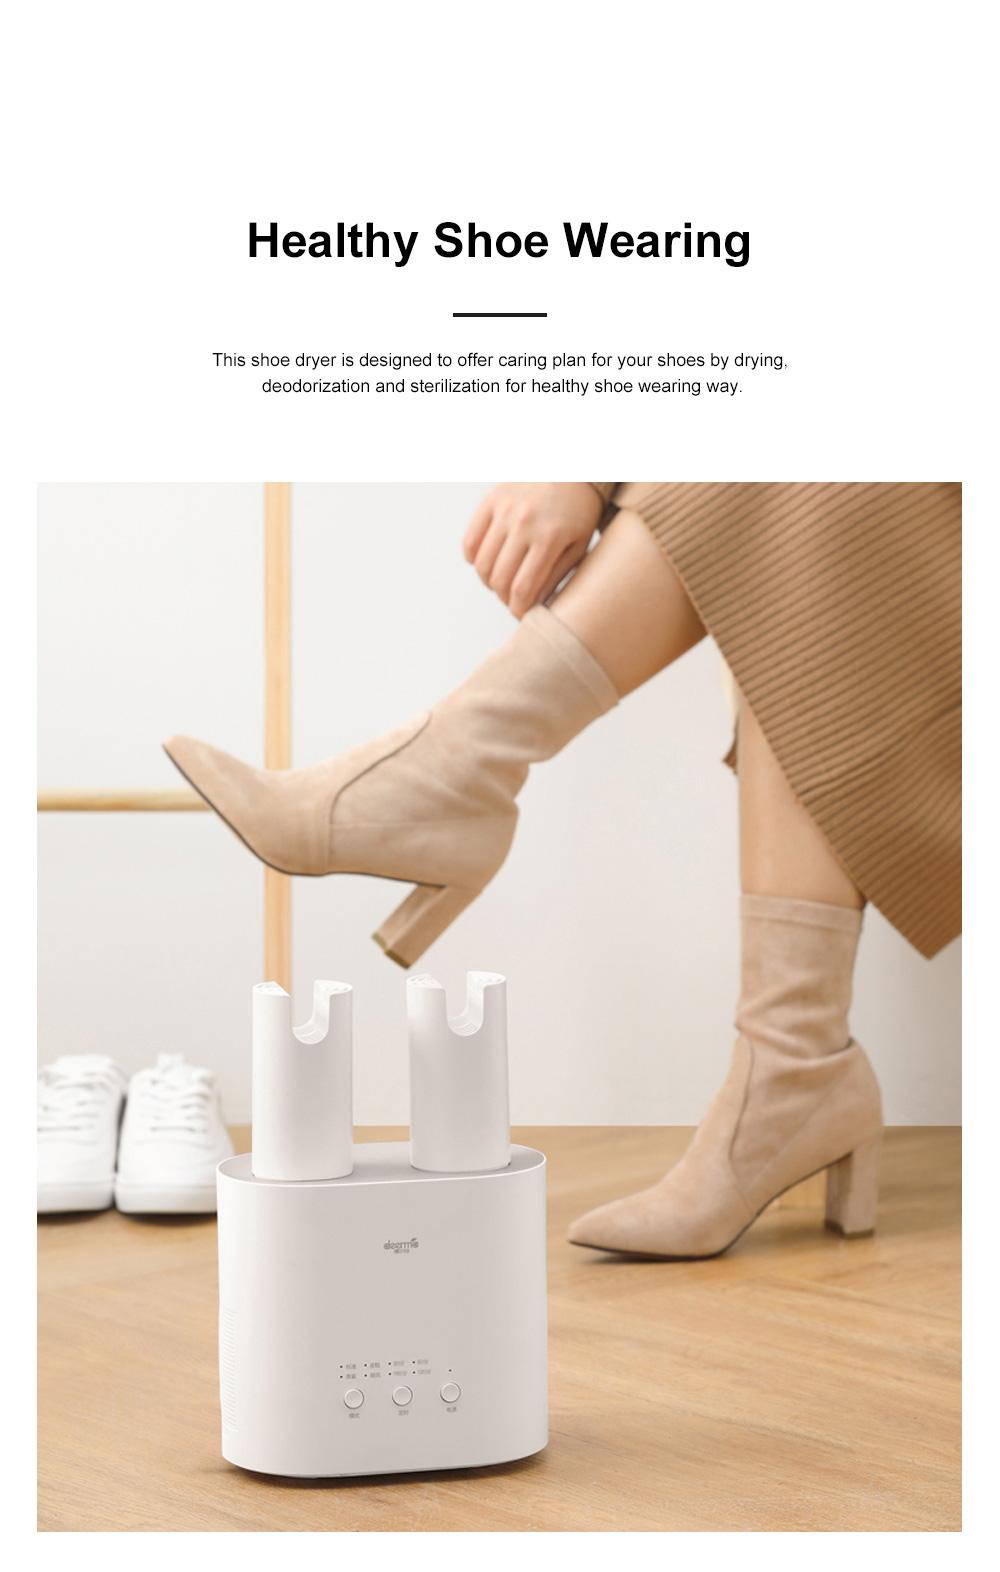 DEERMA Multiple-effect Shoe Dryer for Family Use Deodorizing and Sterilizing Drying Machine Multifunctional Telescopic Shoe Dryer 3